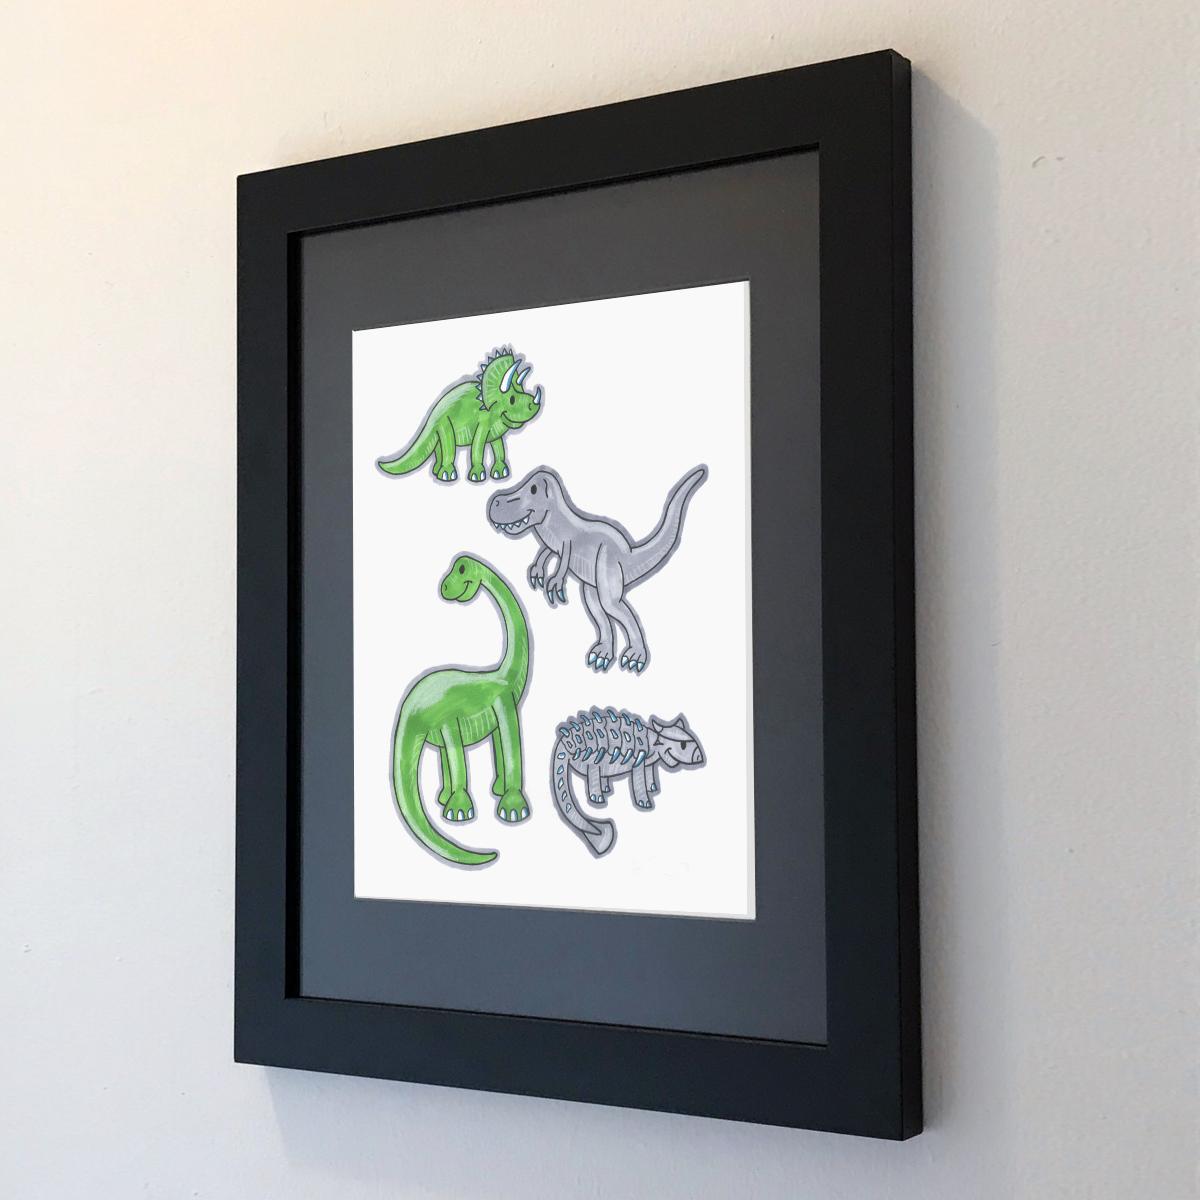 Commissions_Dinosaurs_1200x1200.jpg